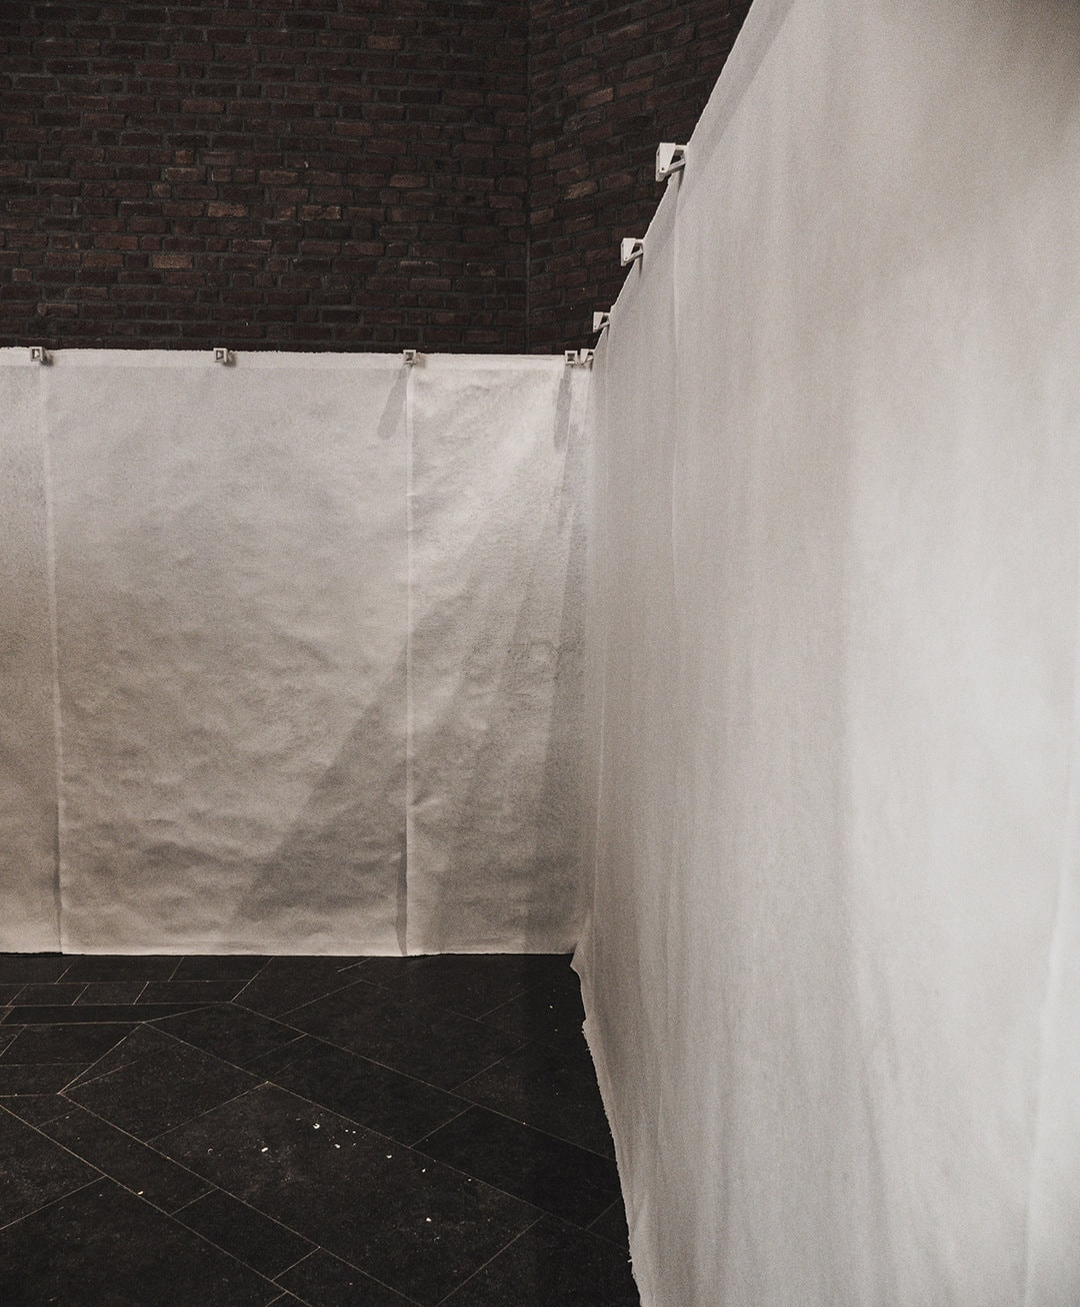 Claudia-Marr-Kunst-Josephsburgstr-l